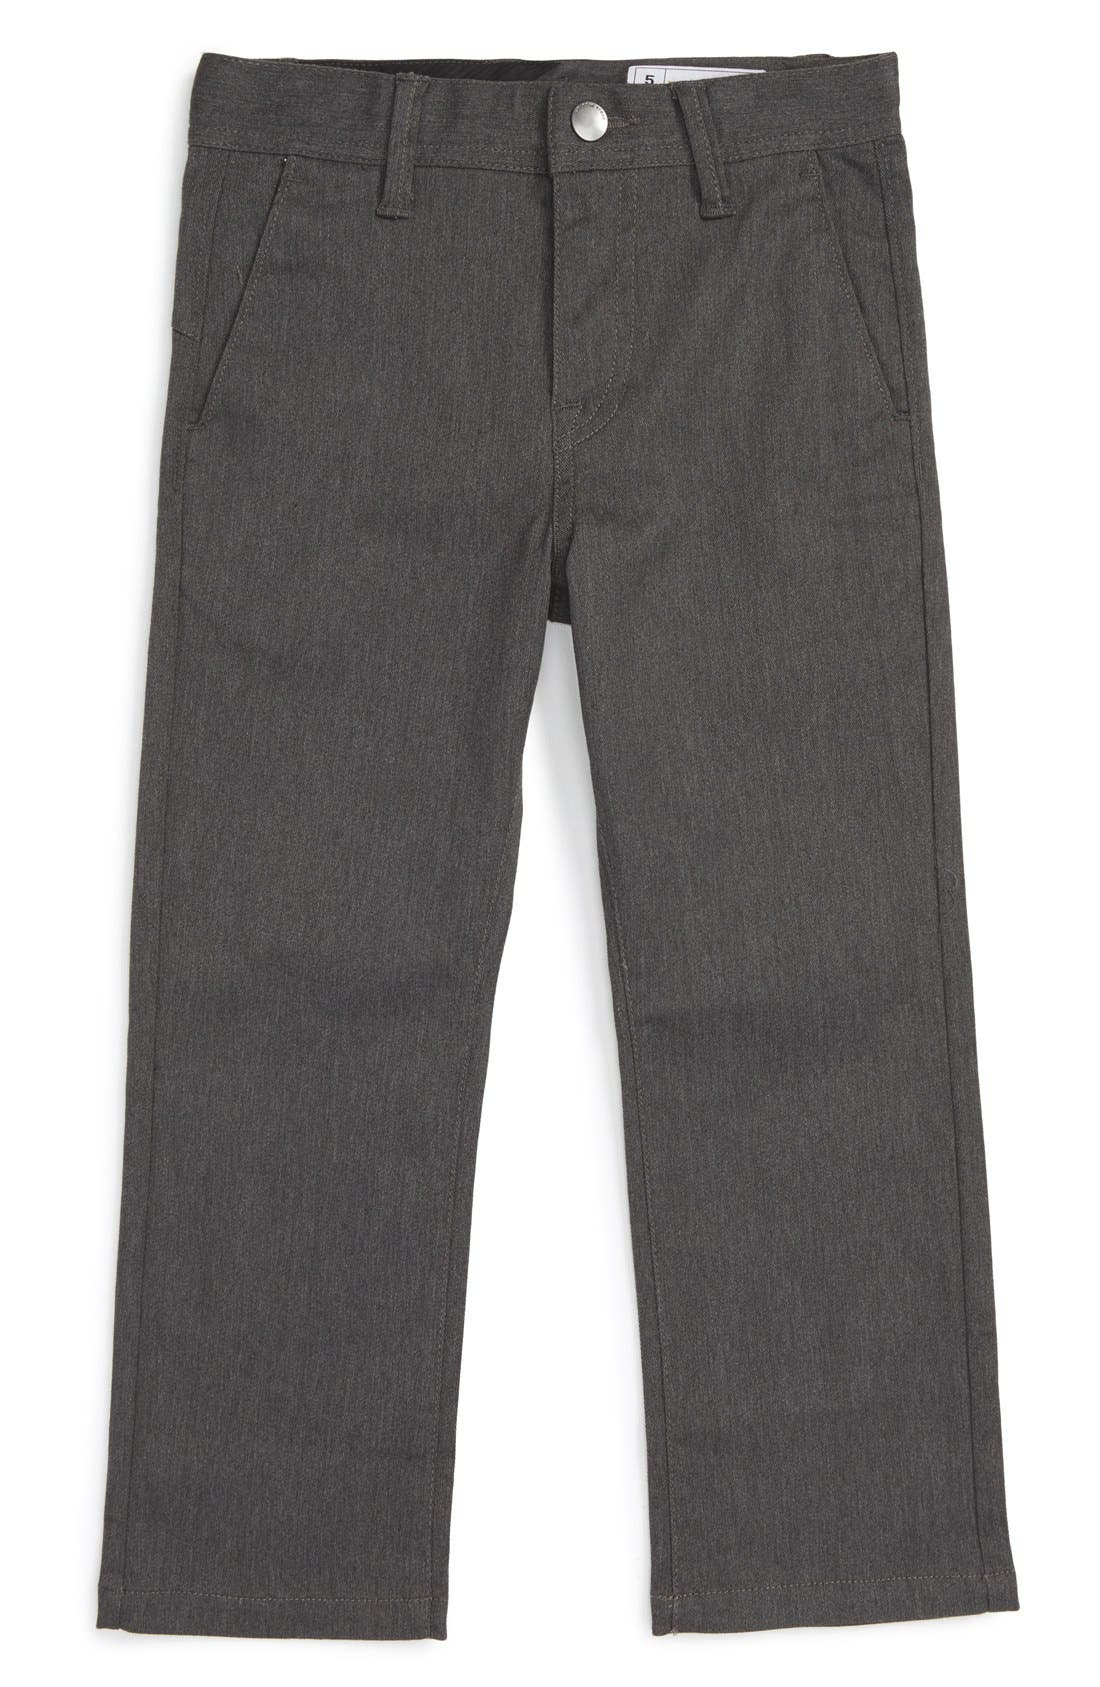 Toddler Boys Volcom Modern Stretch Chinos Size 4T  Grey